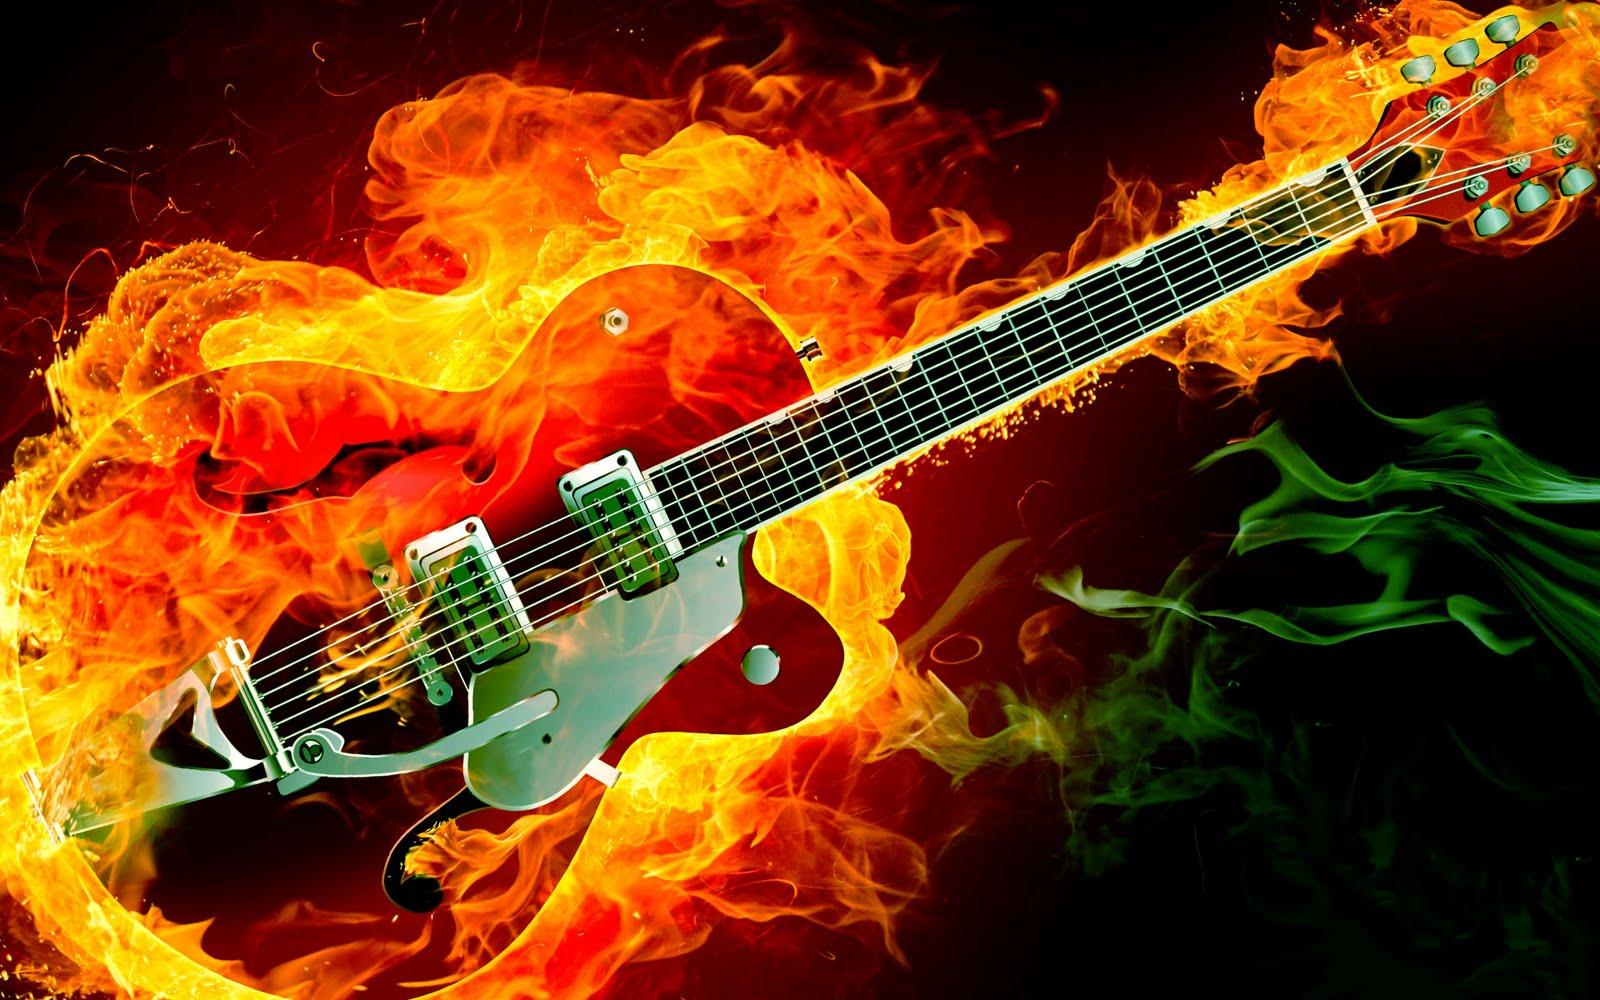 great guitar sound electric rockabilly guitar on fire red green smoke flames hd music desktop. Black Bedroom Furniture Sets. Home Design Ideas